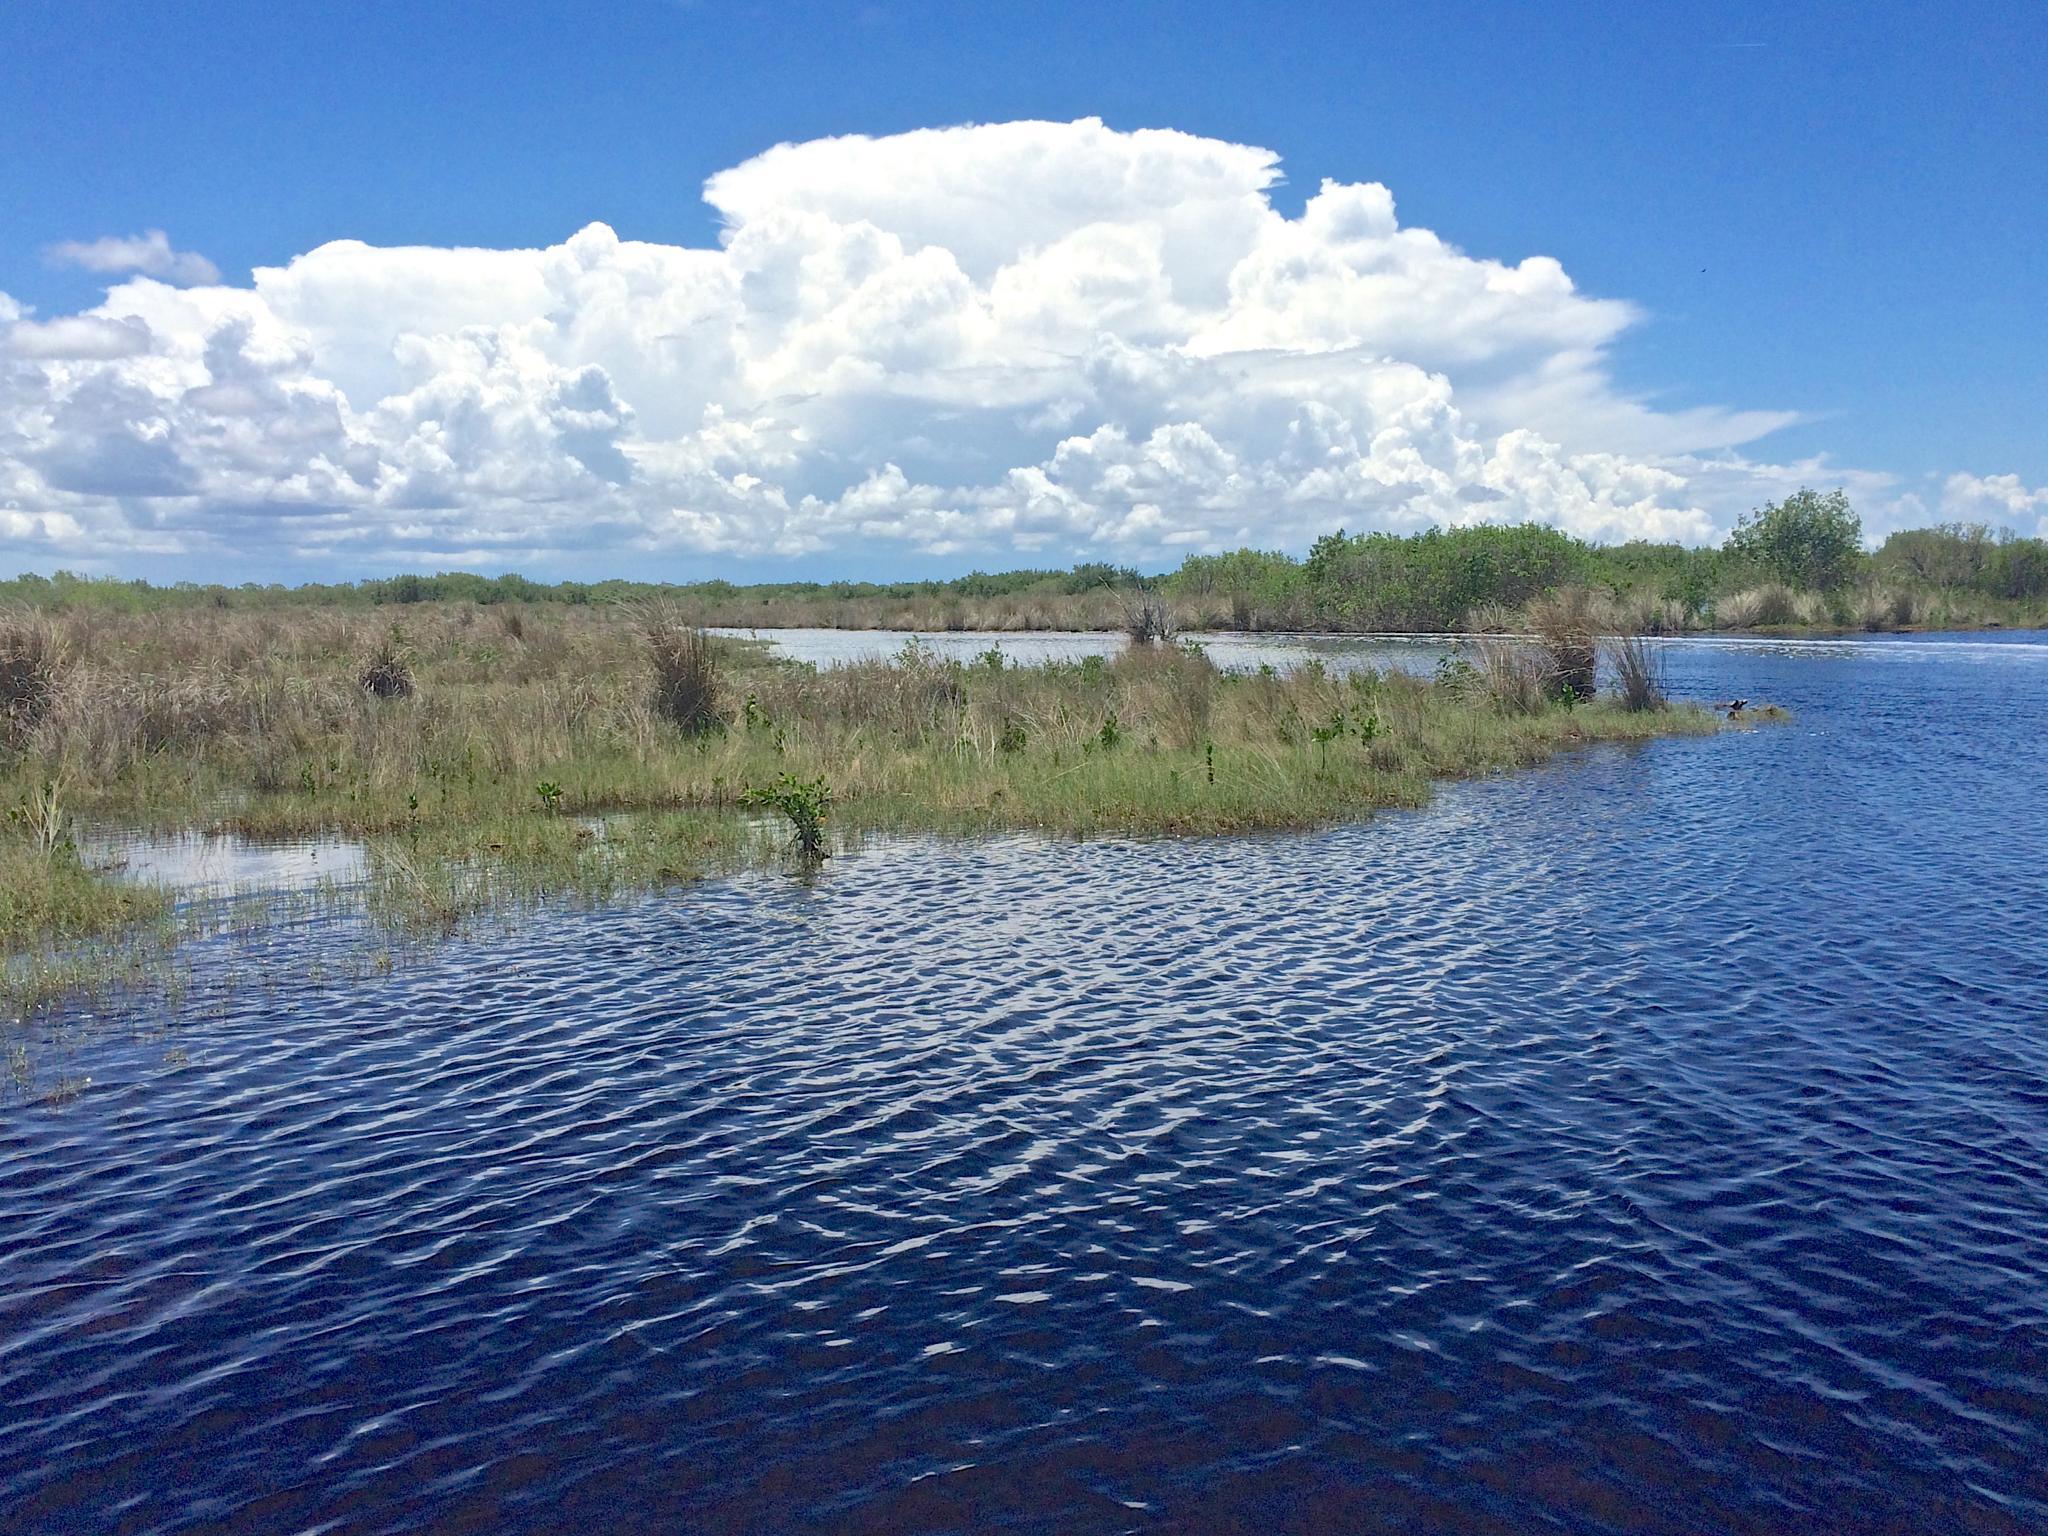 Everglades by marianne250